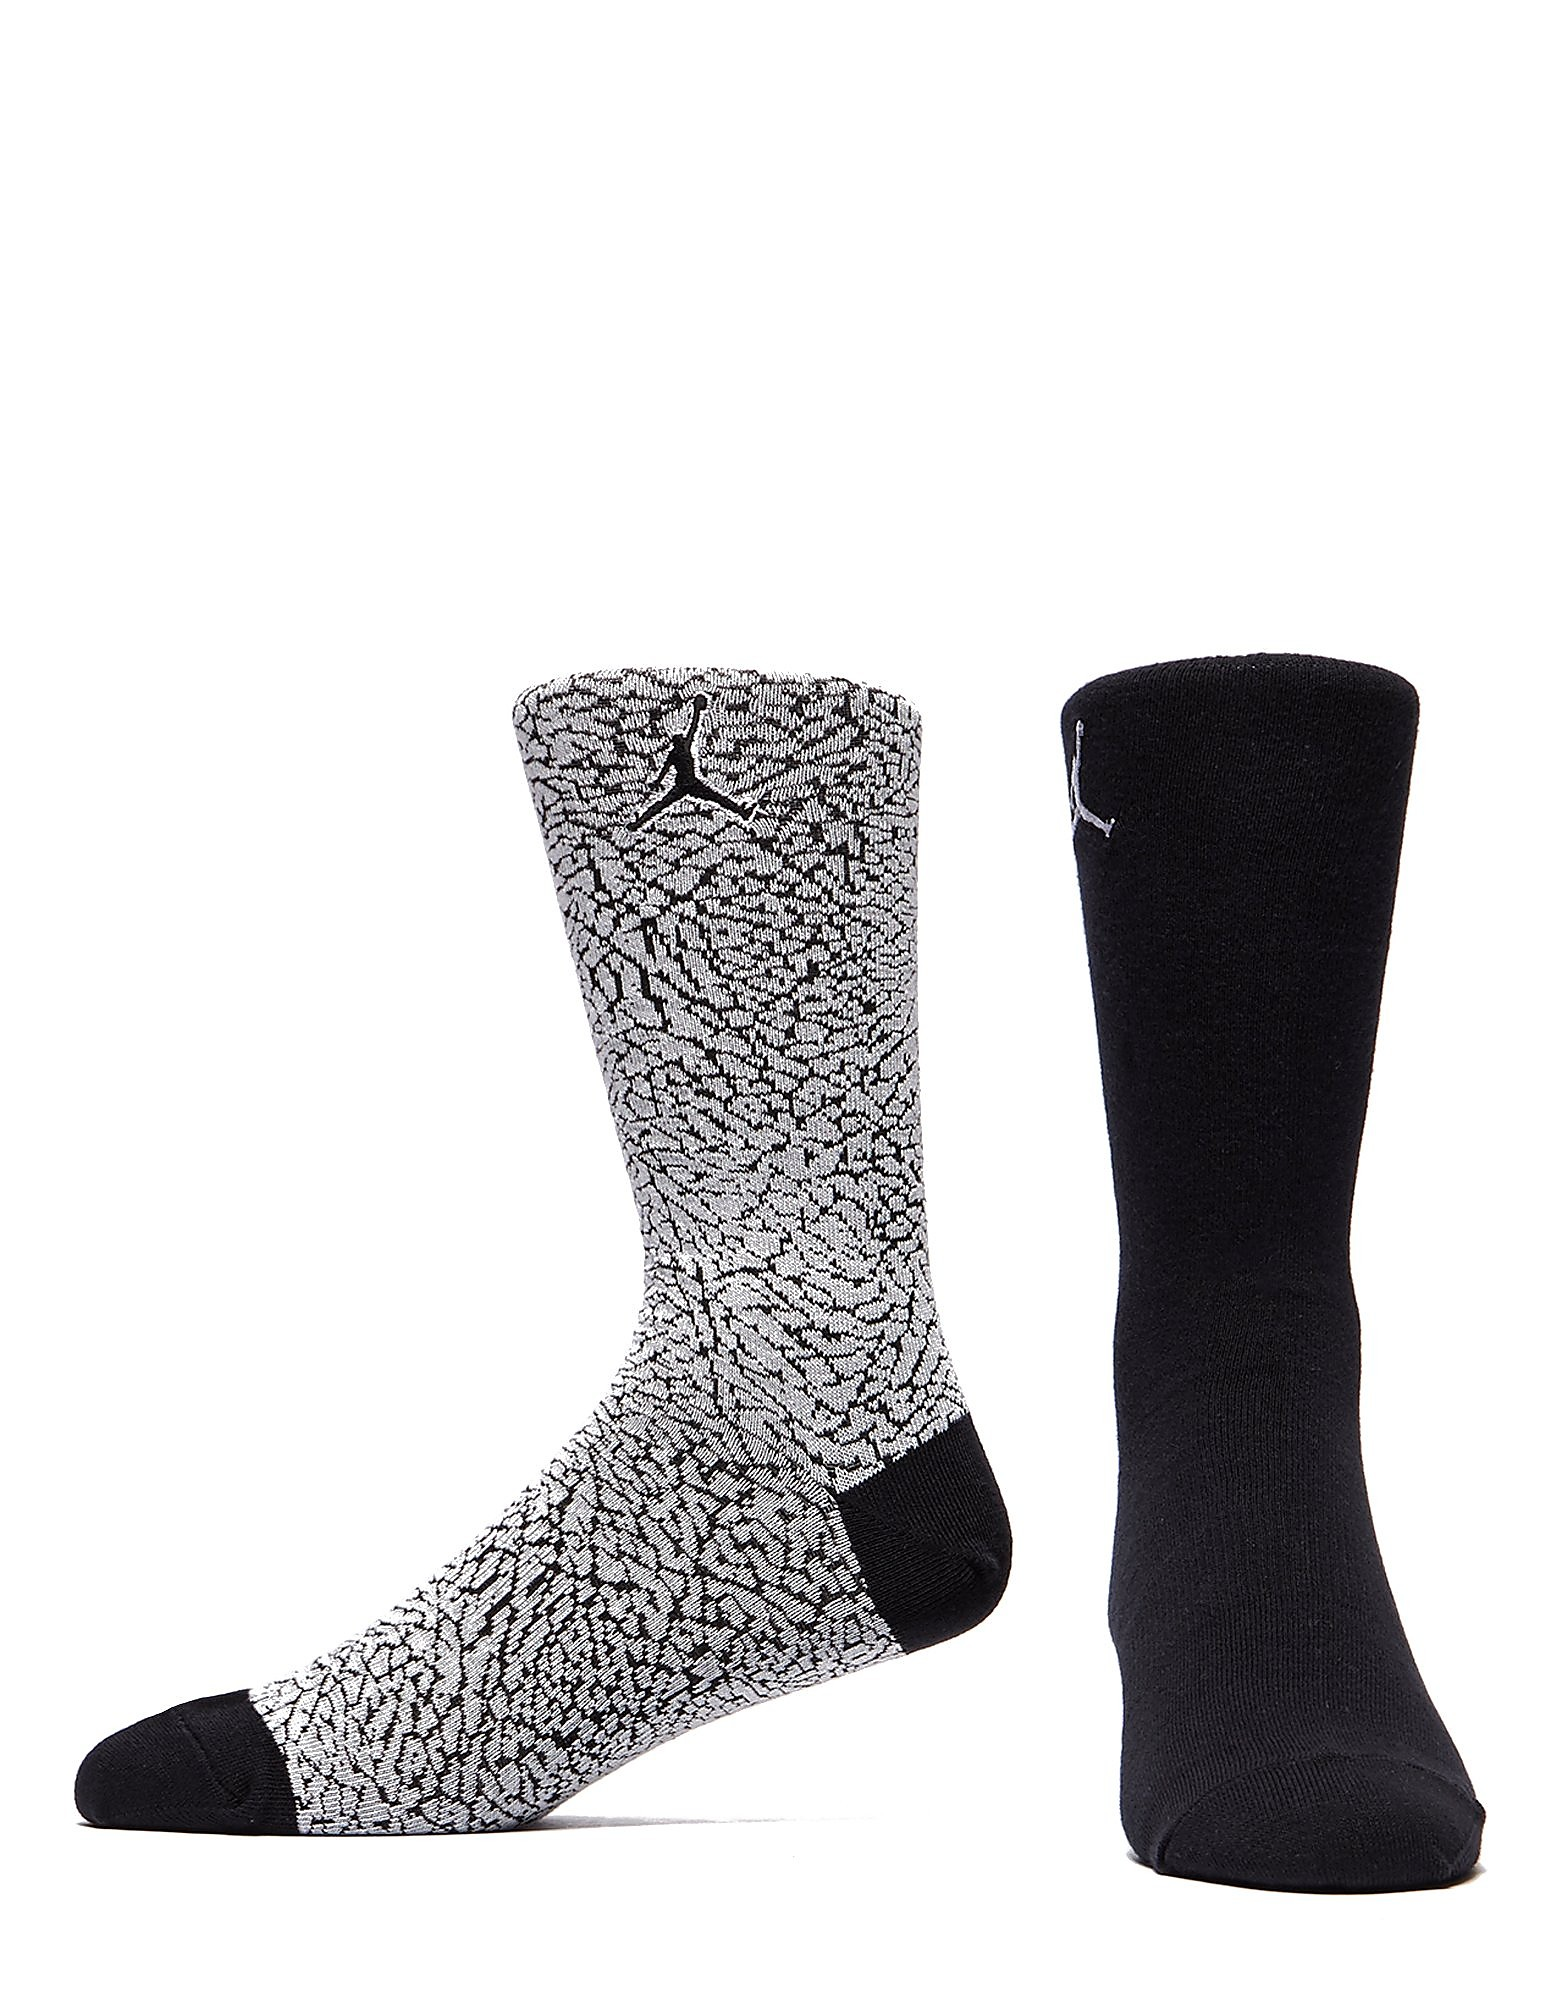 Jordan 2 Pack Elephant Print Socks